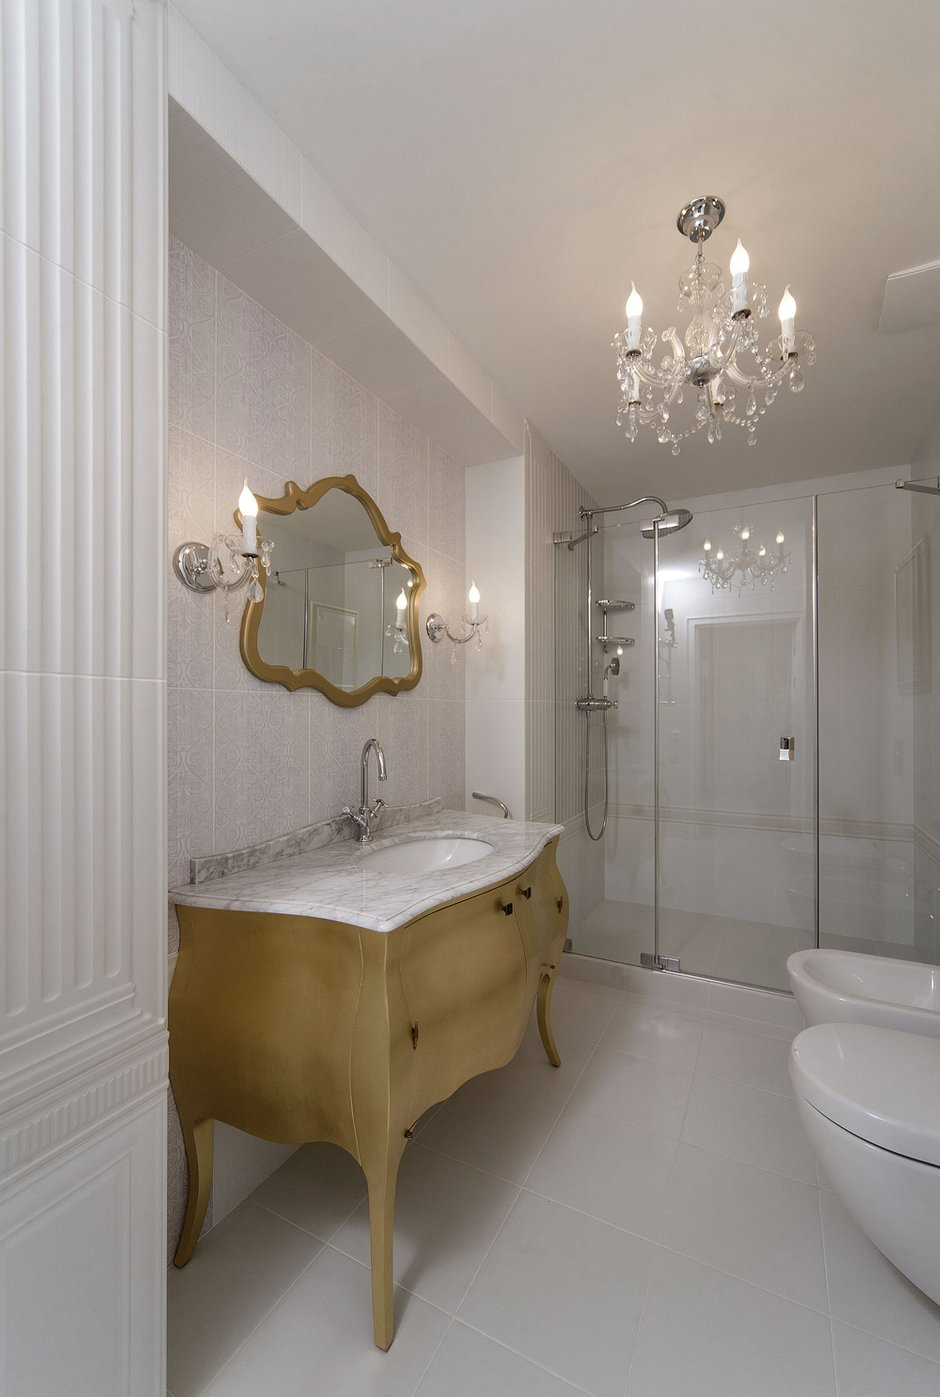 Фотография: Ванная в стиле Классический, Квартира, Дома и квартиры – фото на INMYROOM